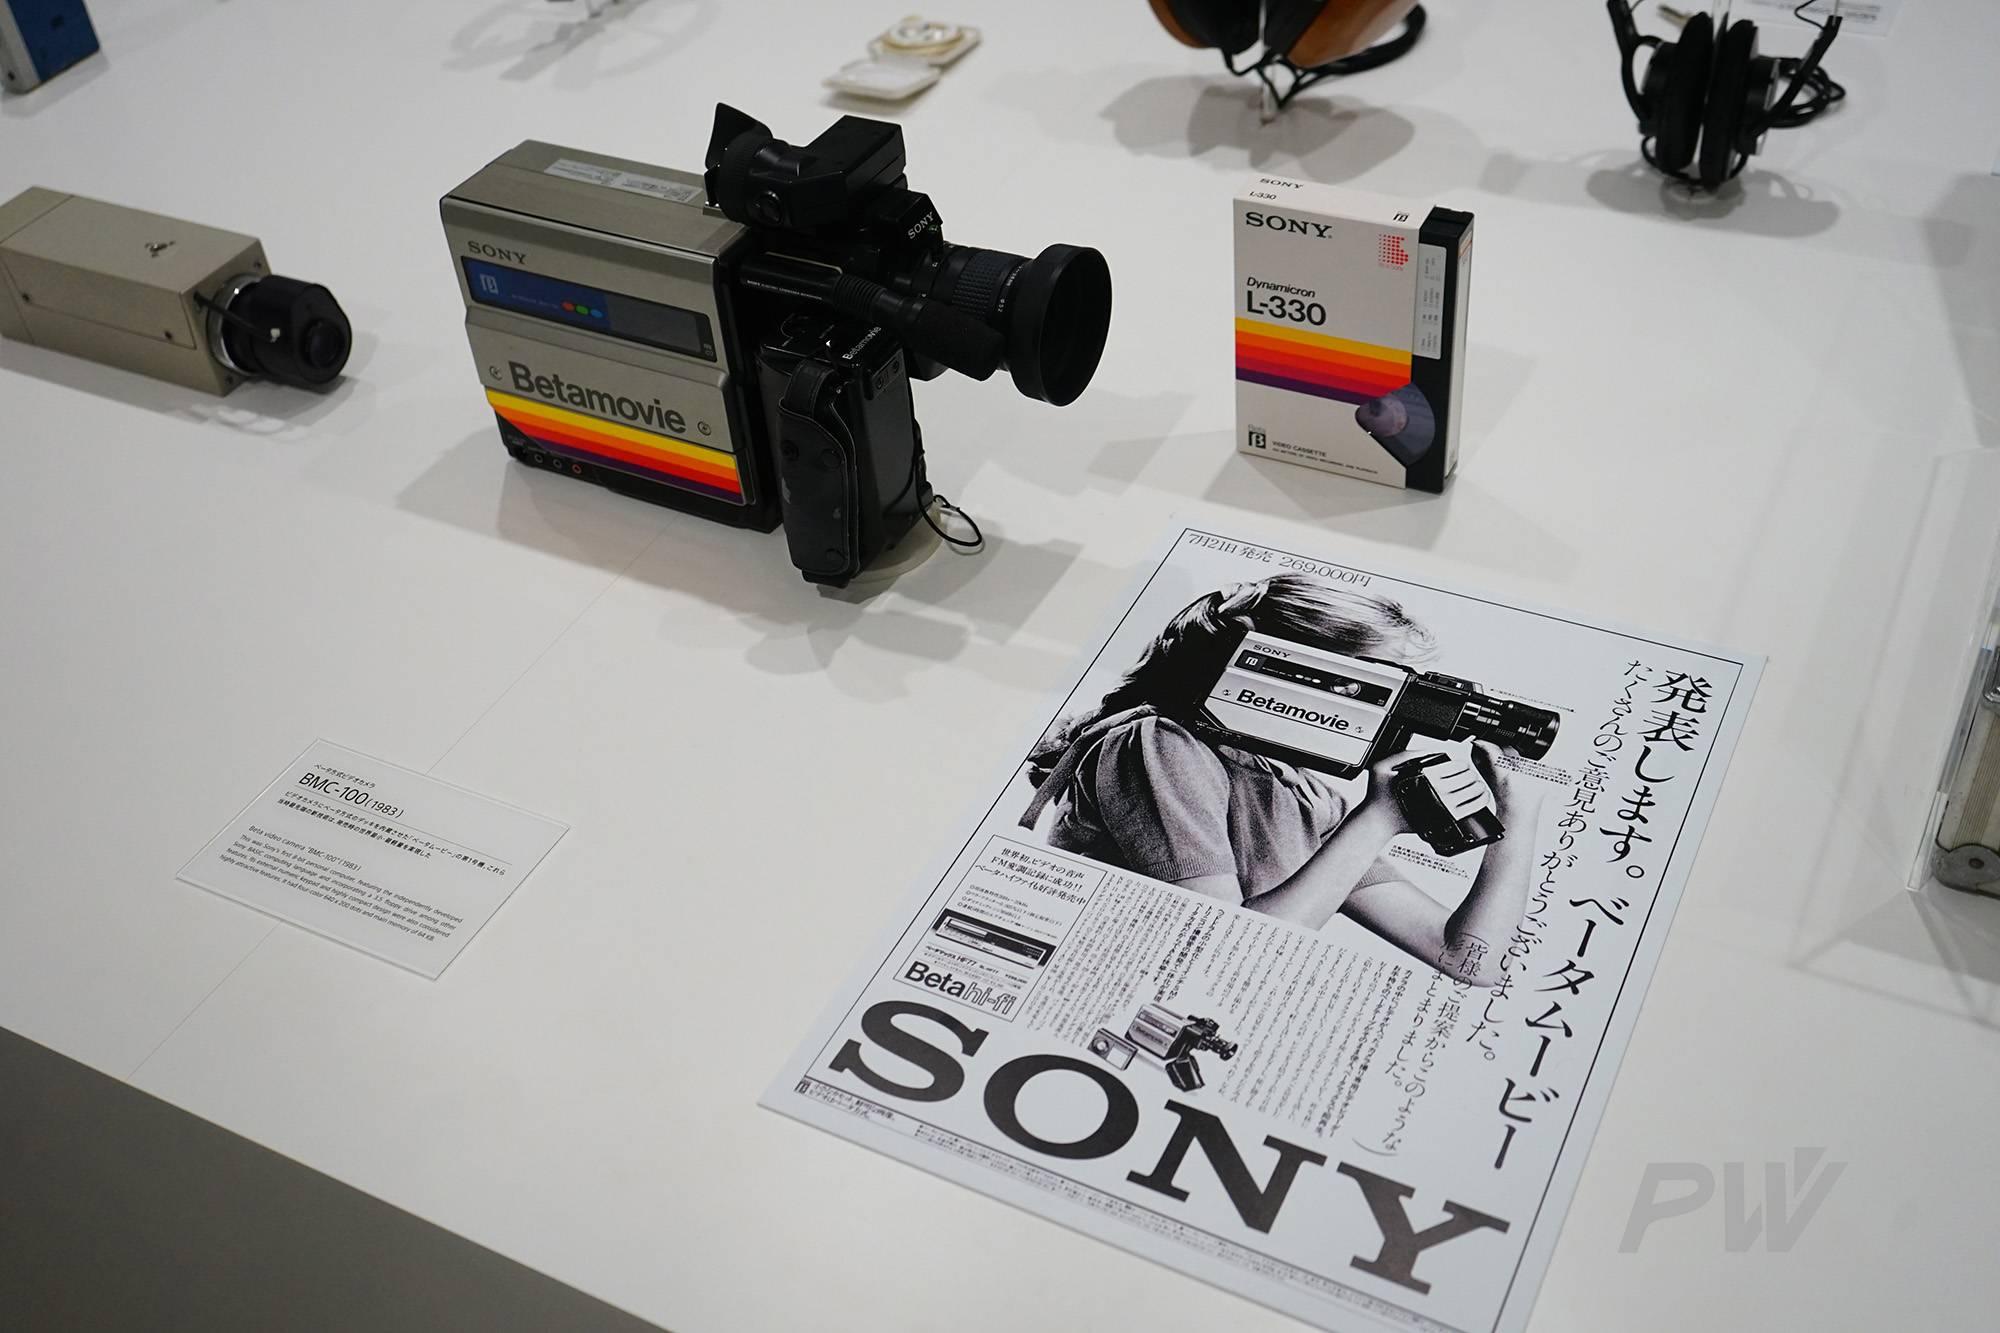 SONY BMC-100